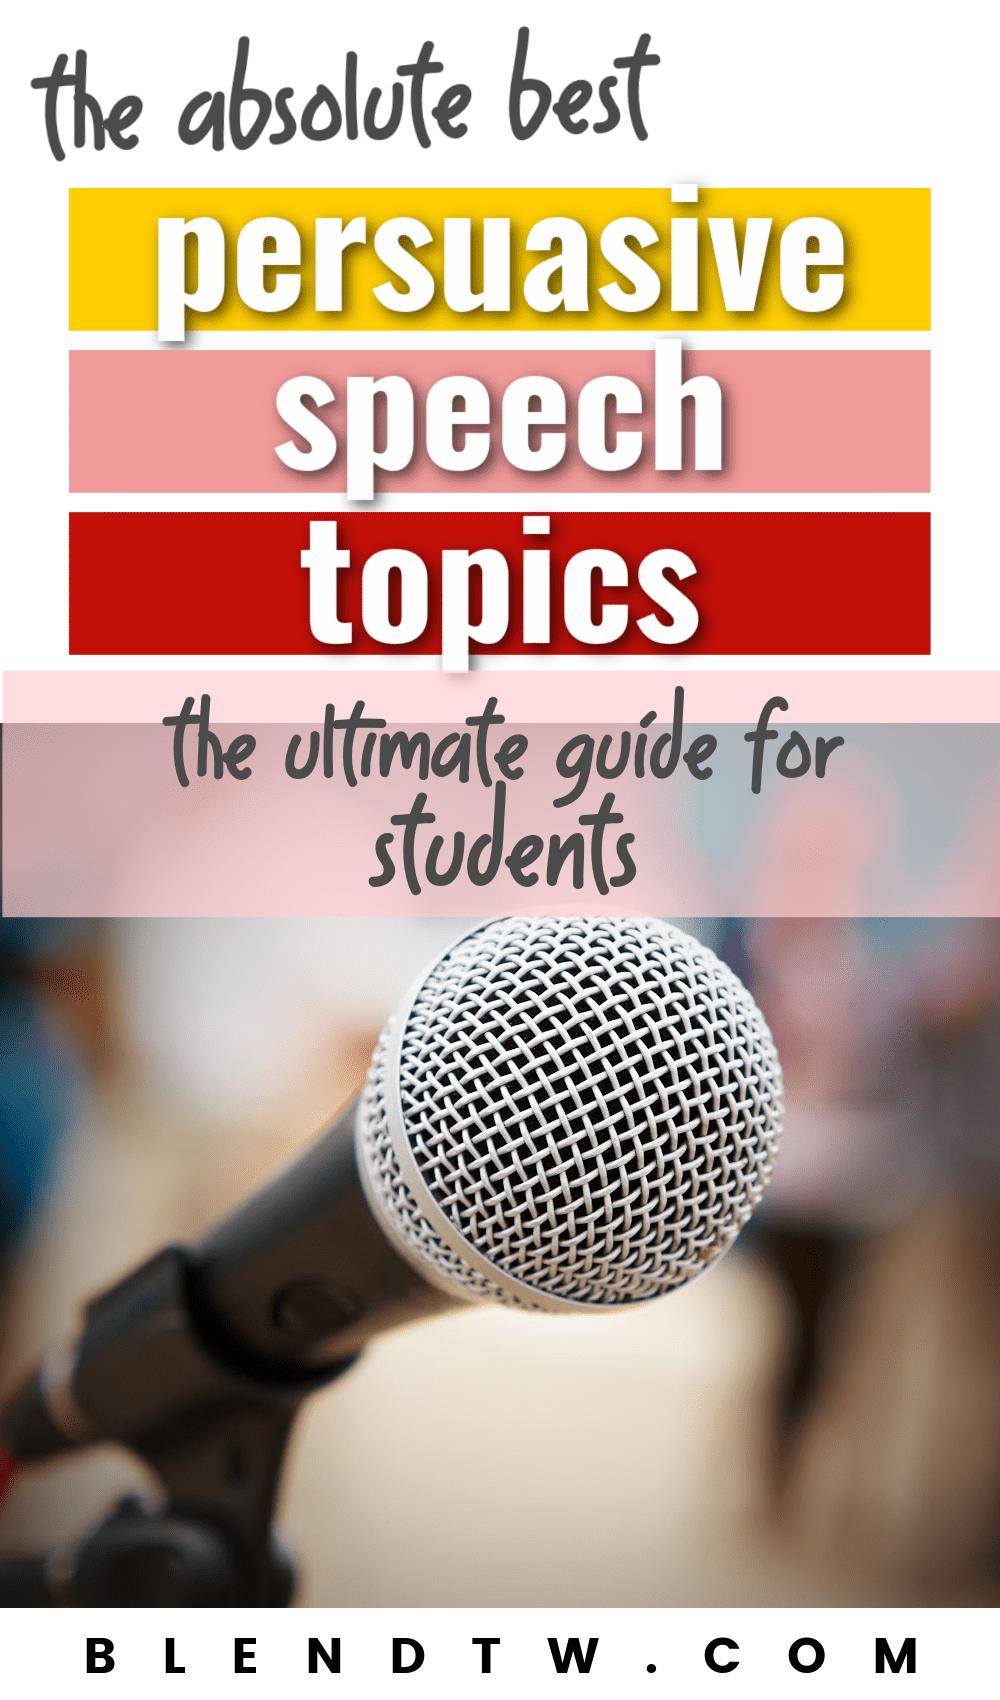 the absolute best persuasive speech topics